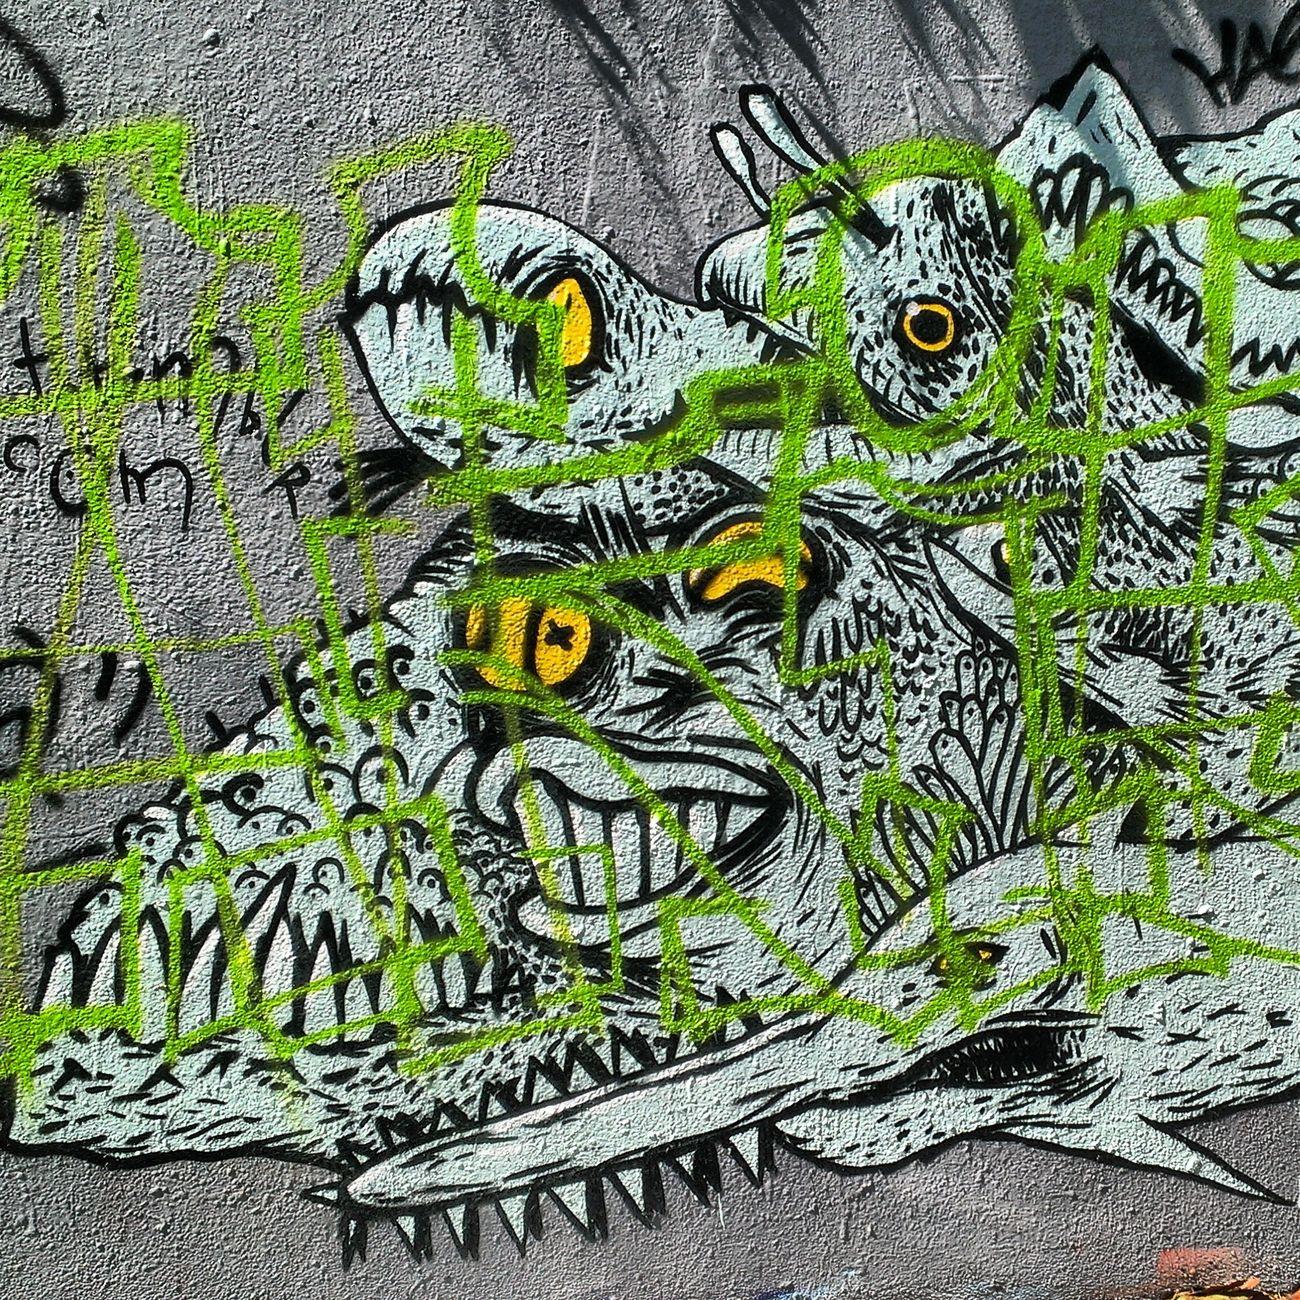 Streetphotography Streetart Graffiti